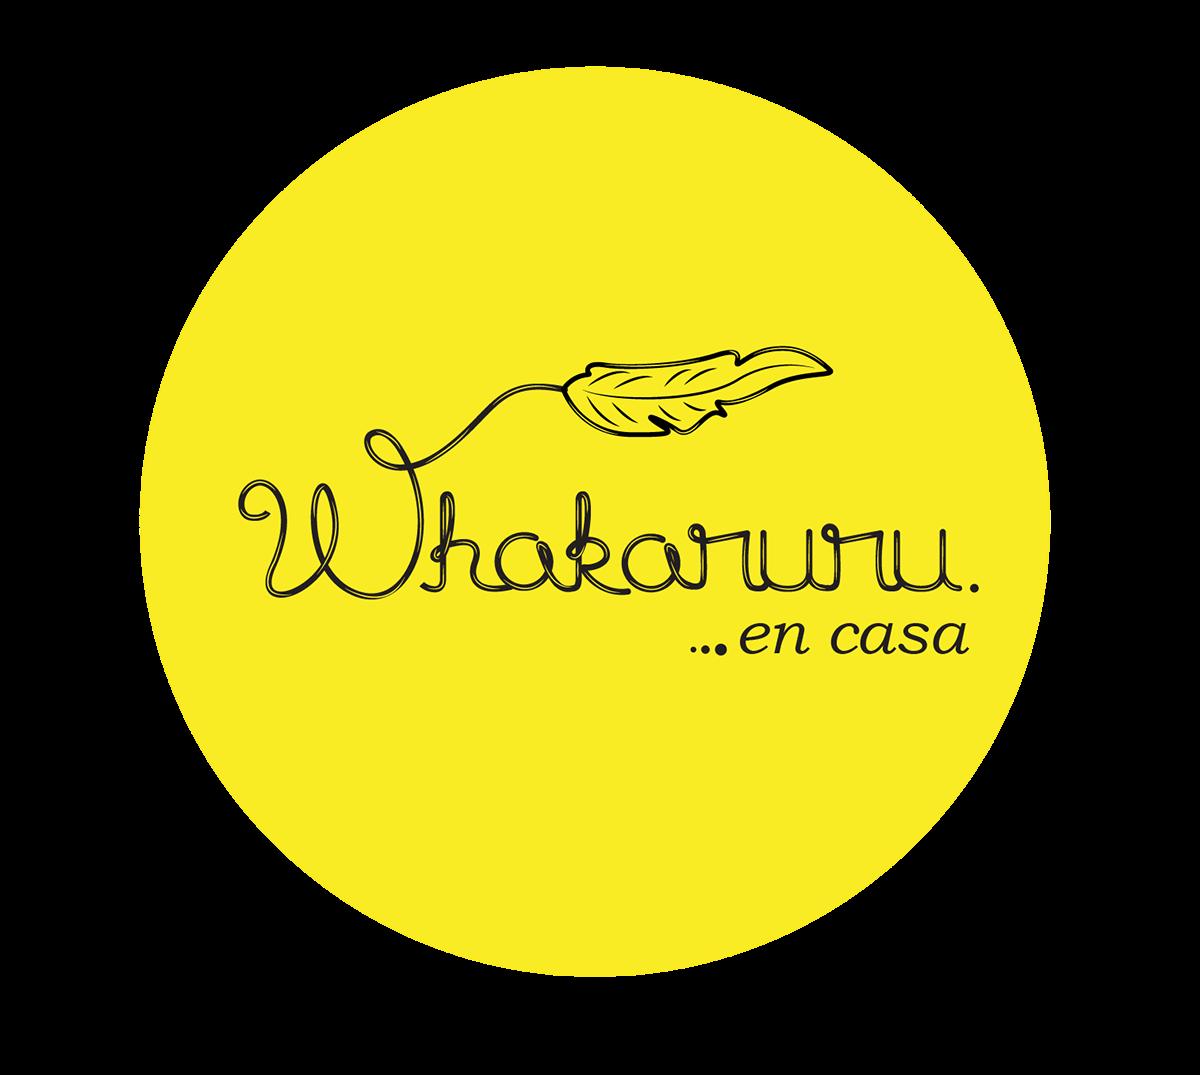 brand yellow pattern plants natural organic deco simple Good nice brand logo